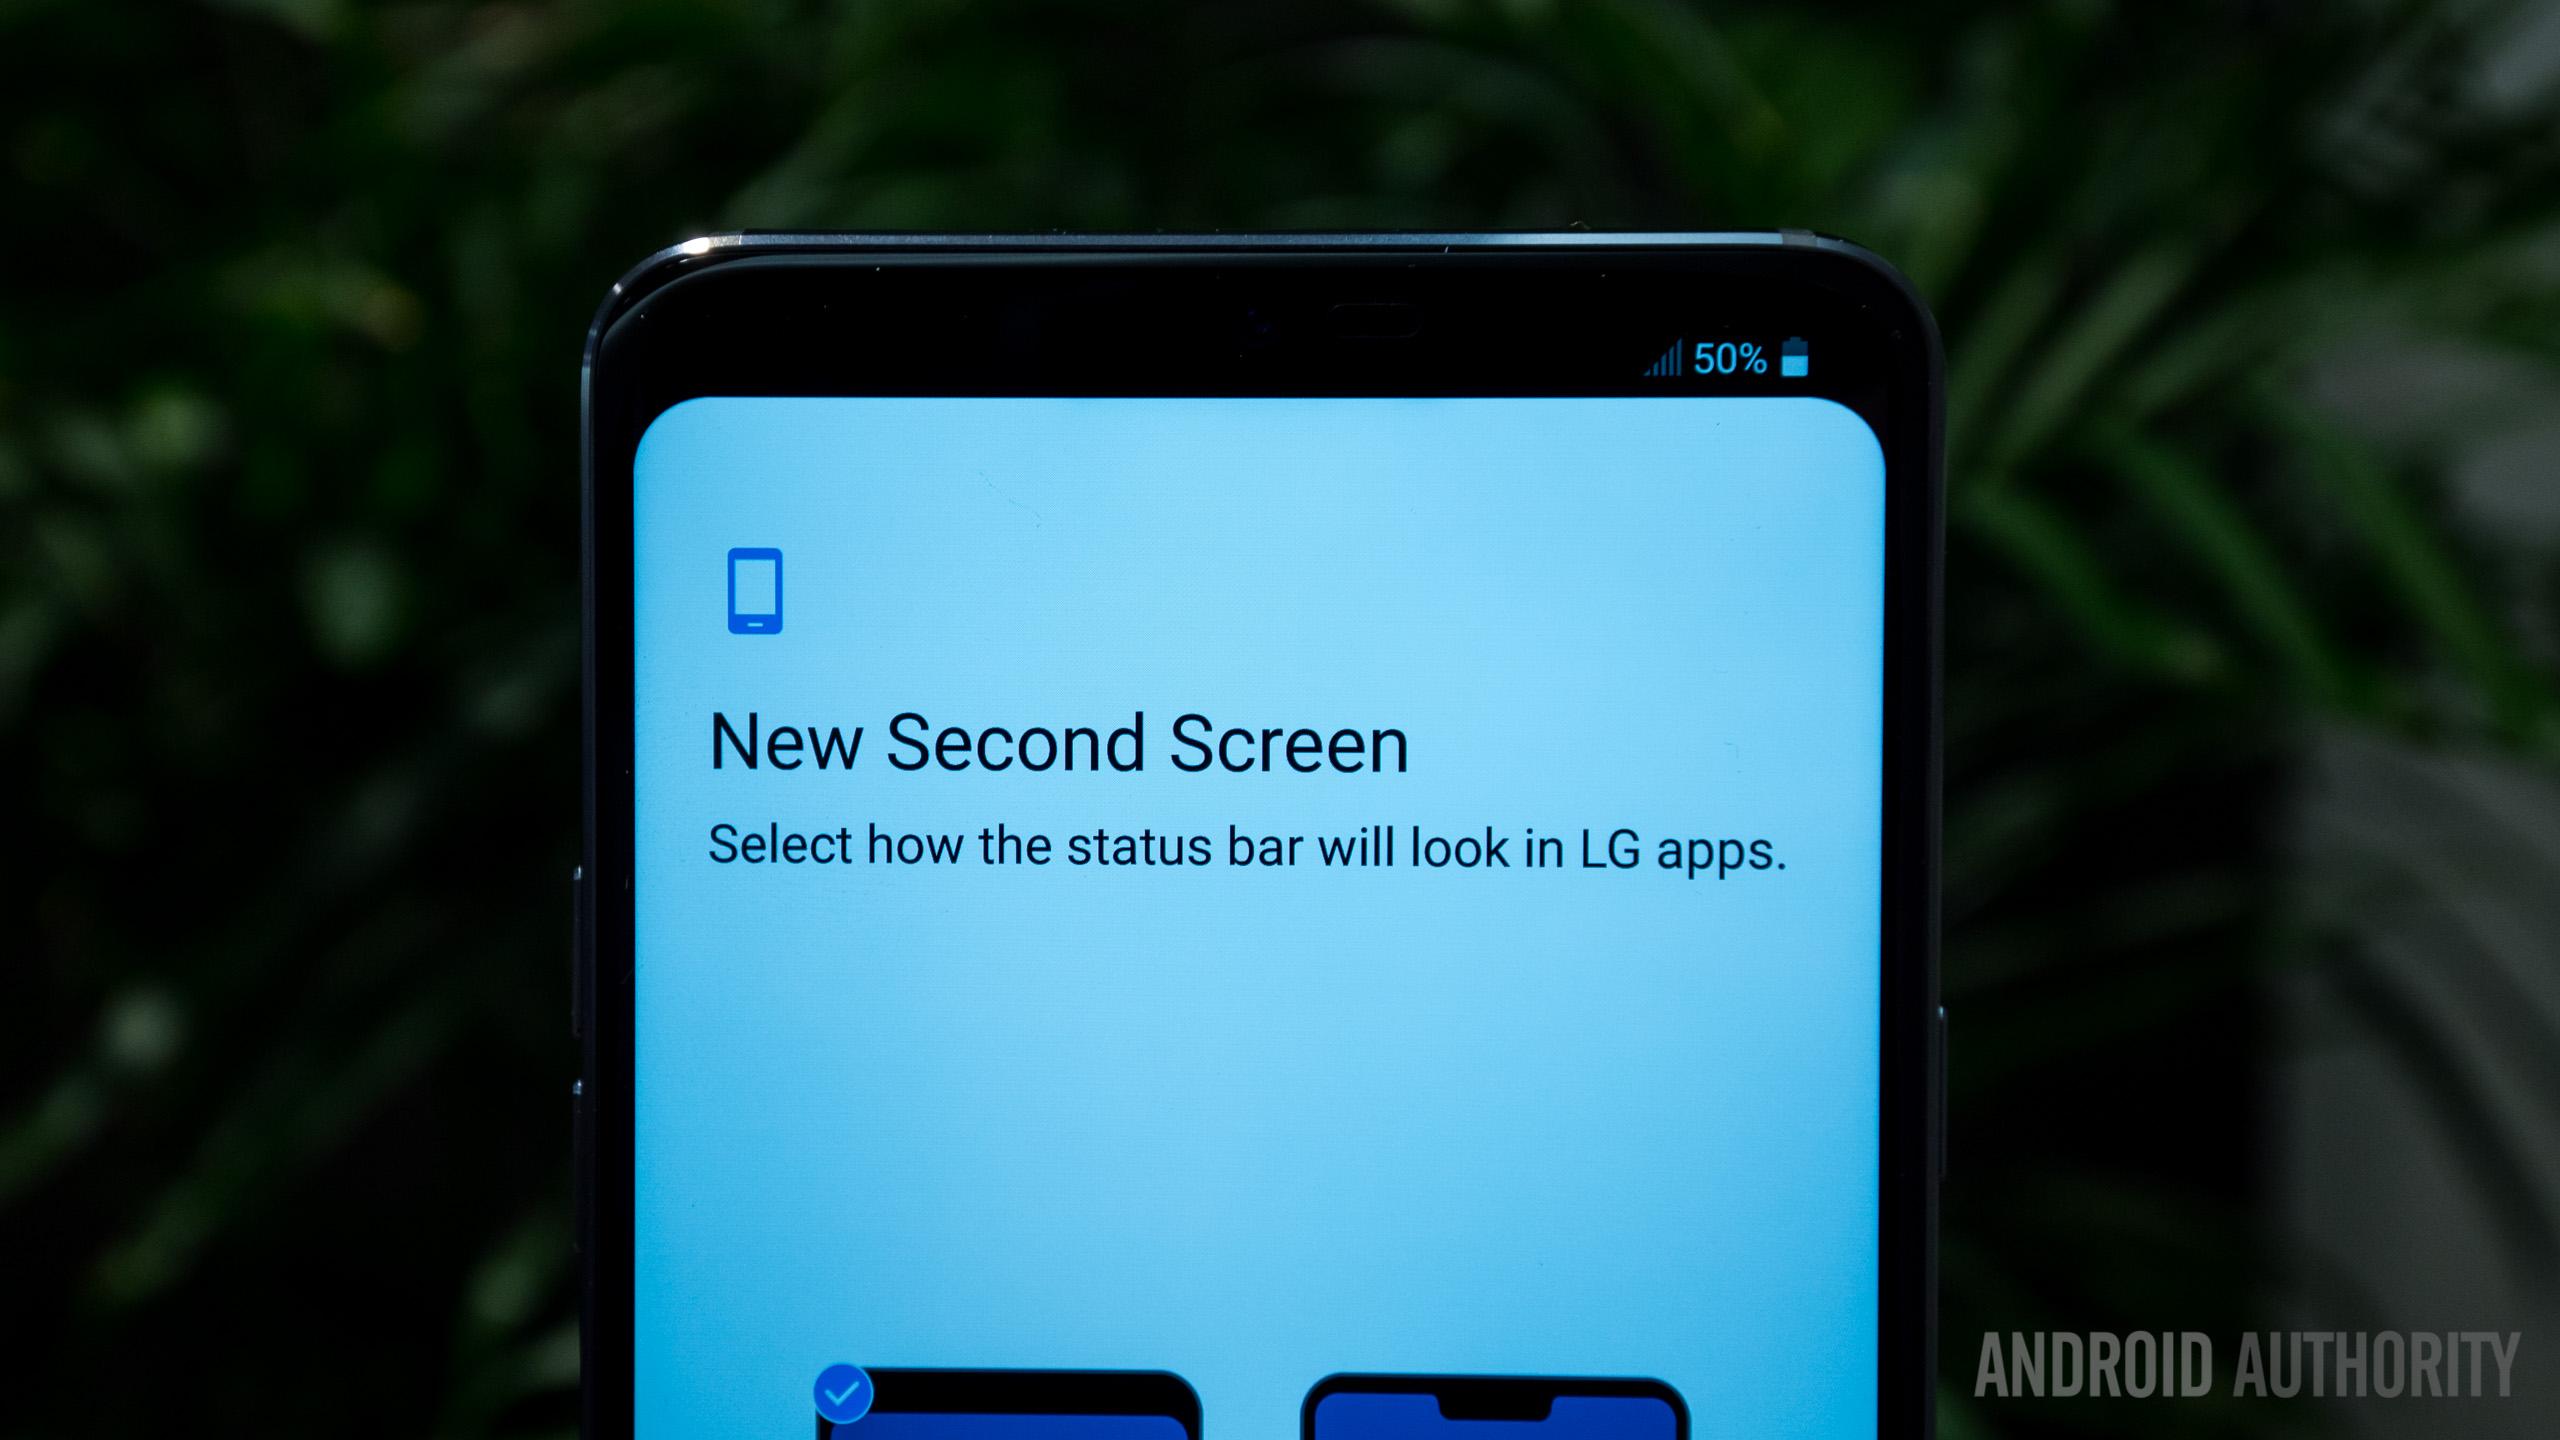 LG G7 ThinQ second screen